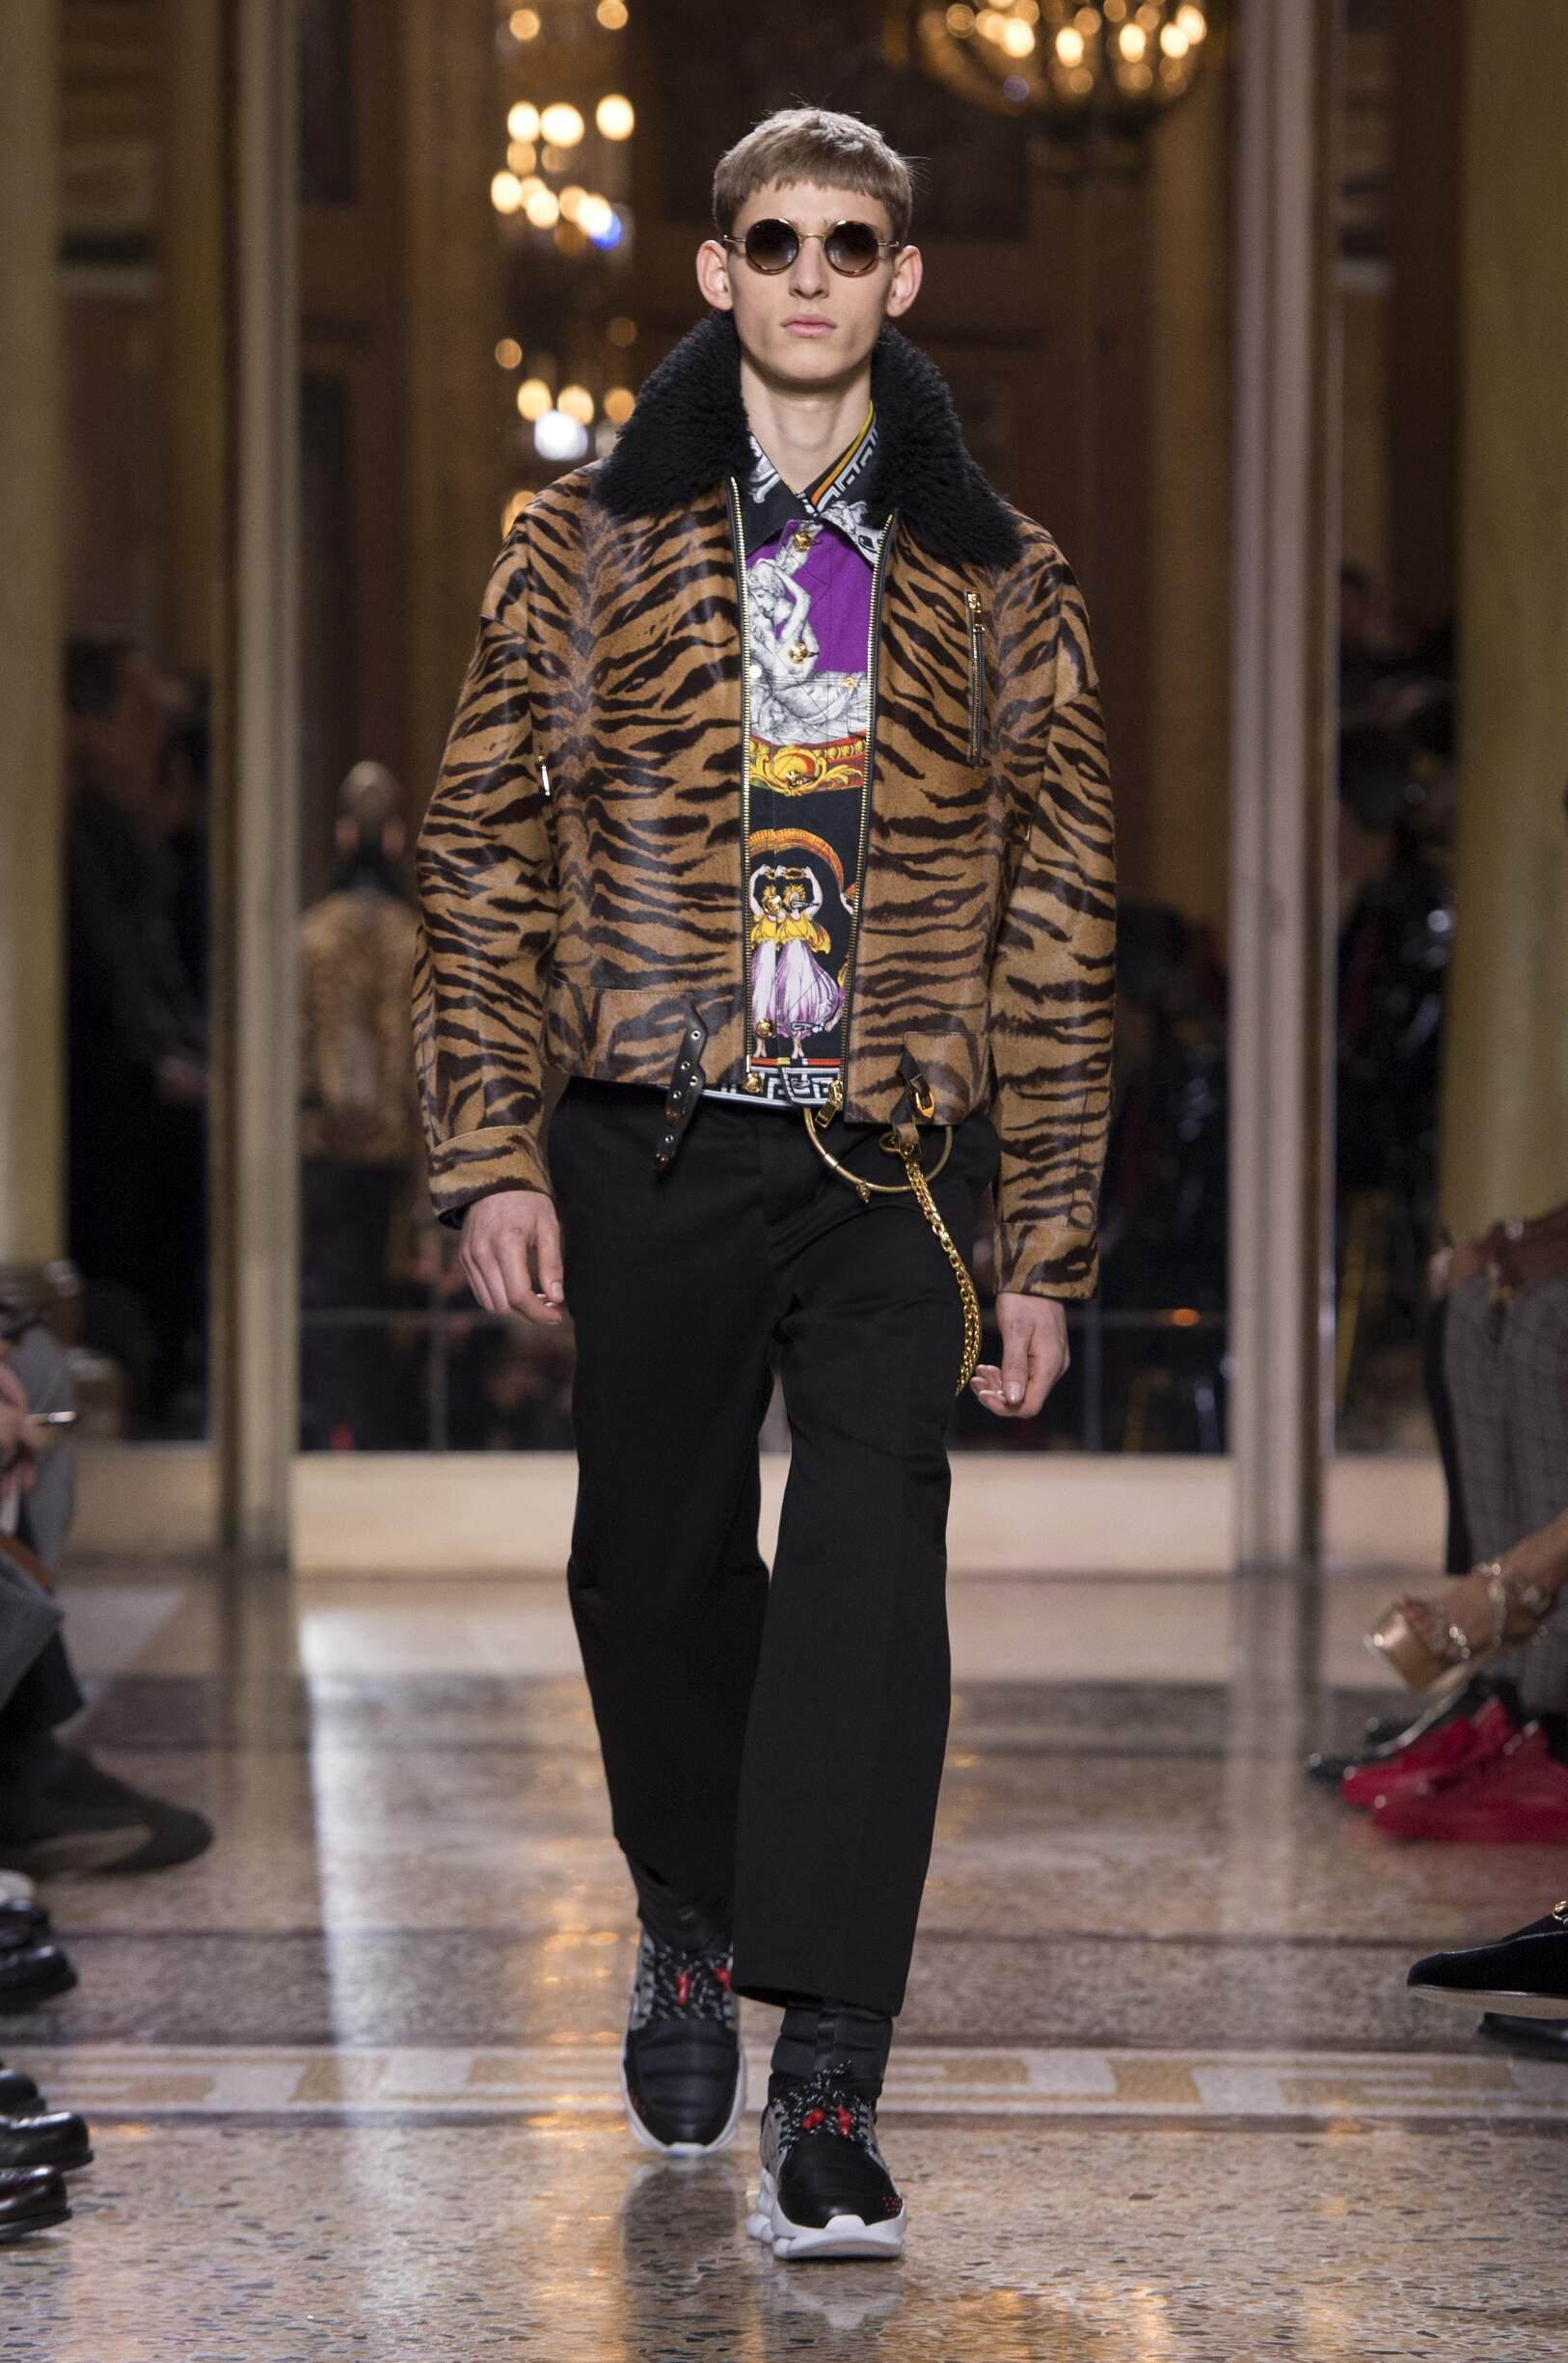 Catwalk Versace Man Fashion Show Winter 2018